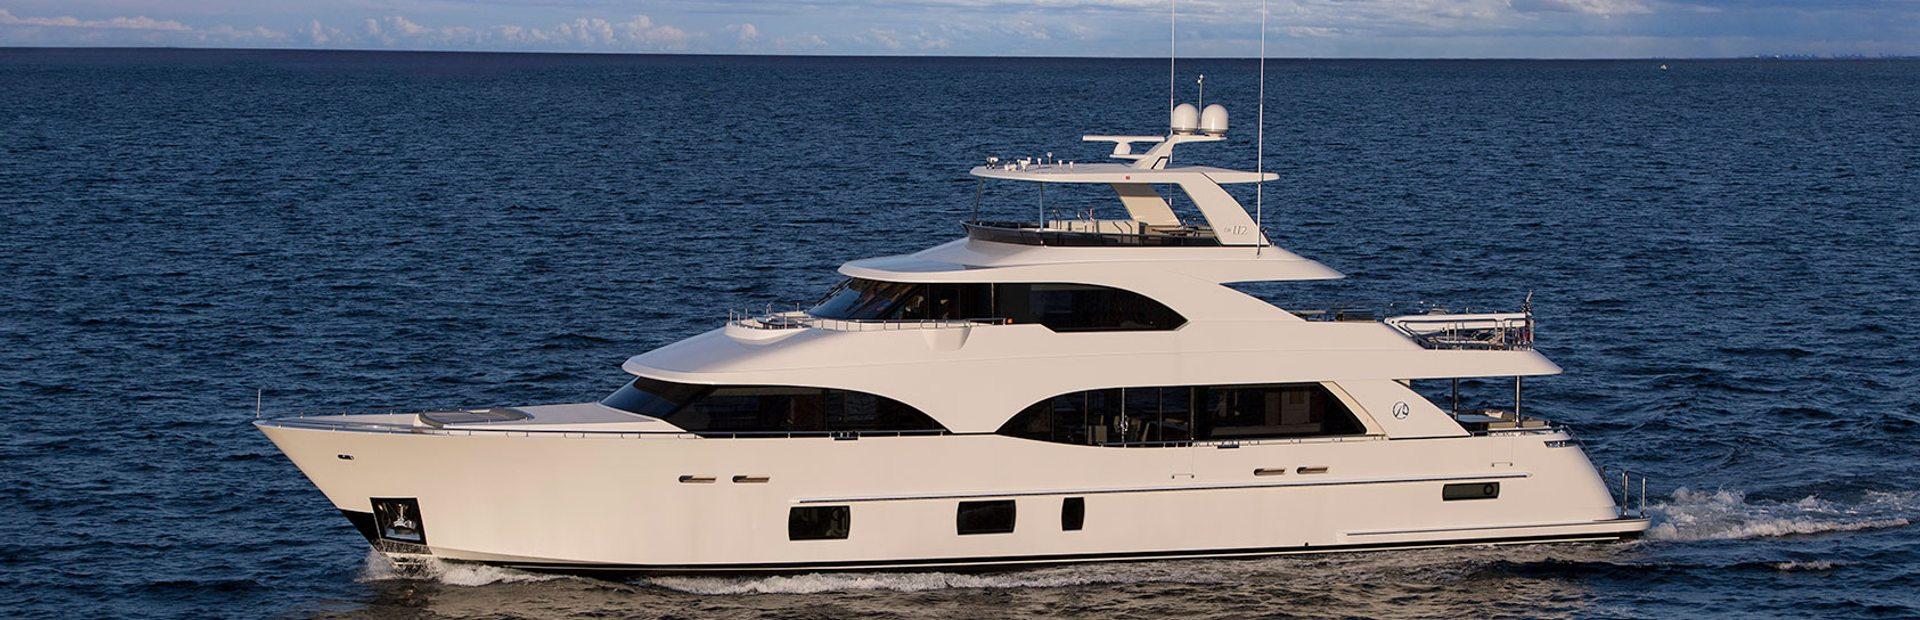 118 Megayacht Yacht Charter